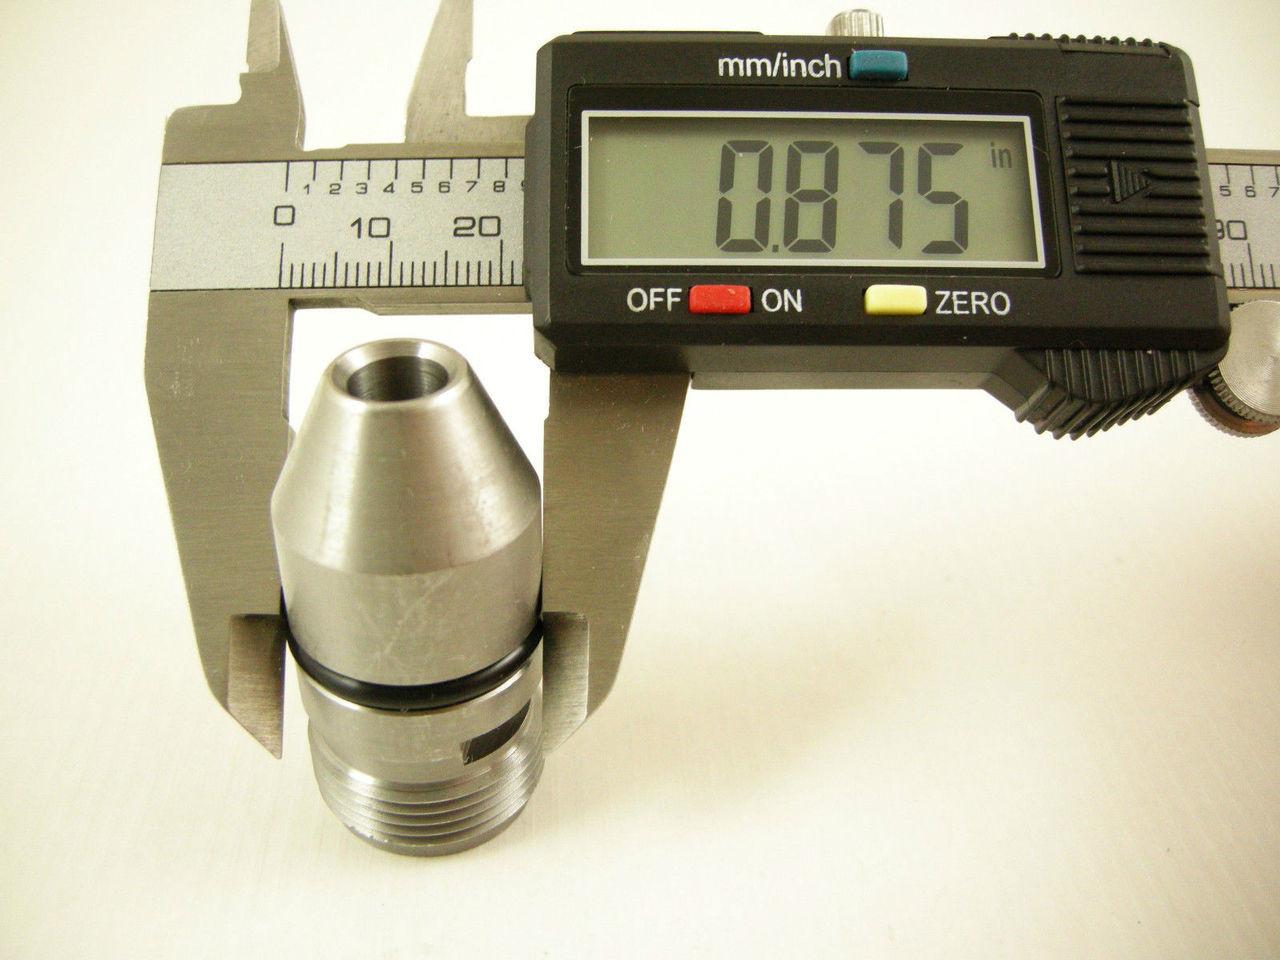 ALUMINUM POWERGLIDE SPEEDO GEAR SLEEVE HOUSING Aluminum Powerglide Transmission Speedometer